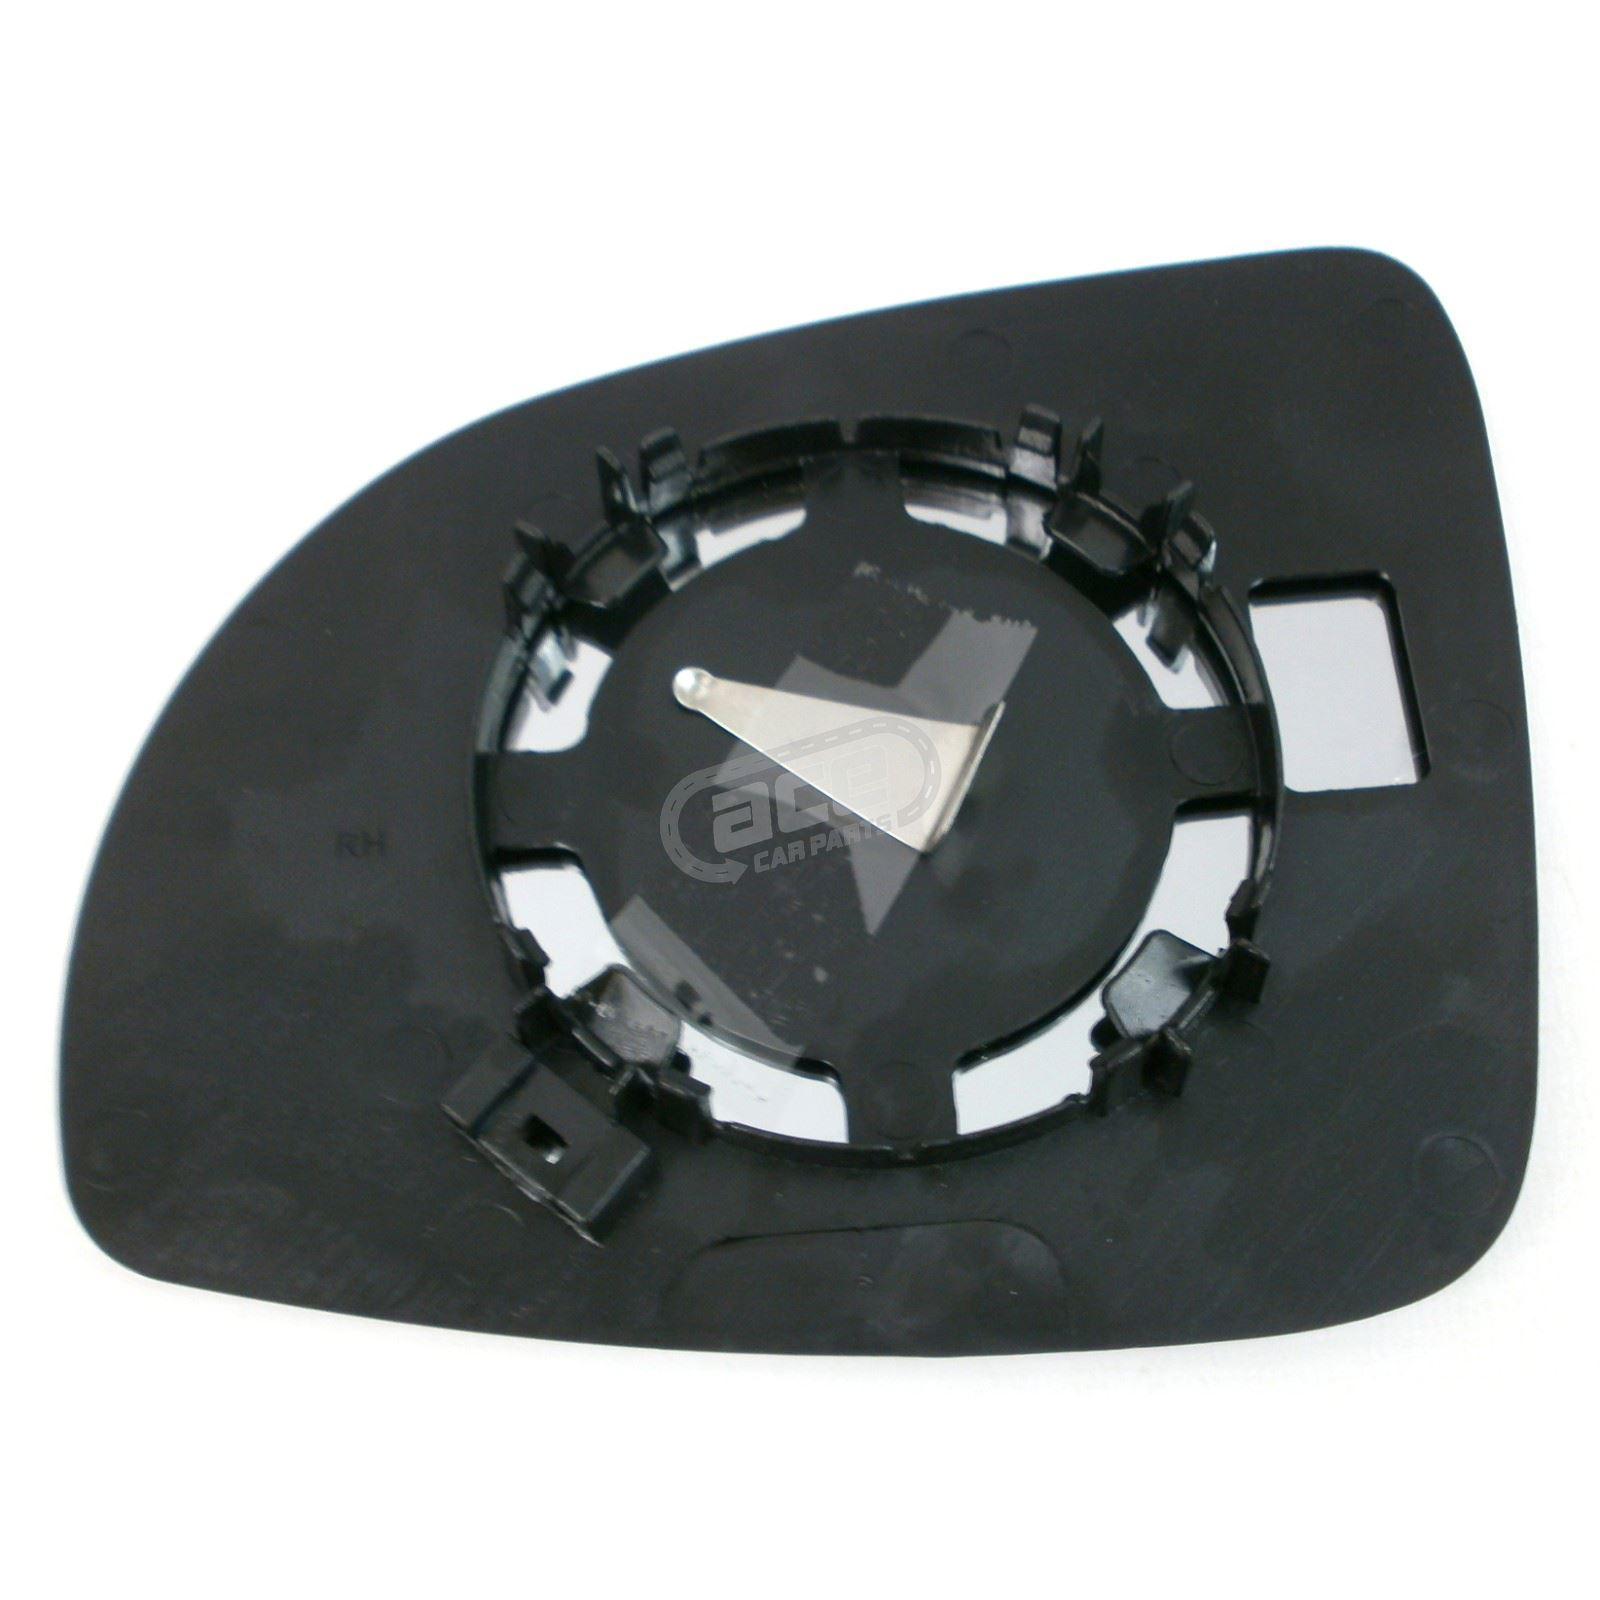 Kia Picanto Hatchback 7//2007-9//2011 Non-Heated Convex Mirror Glass Drivers Side